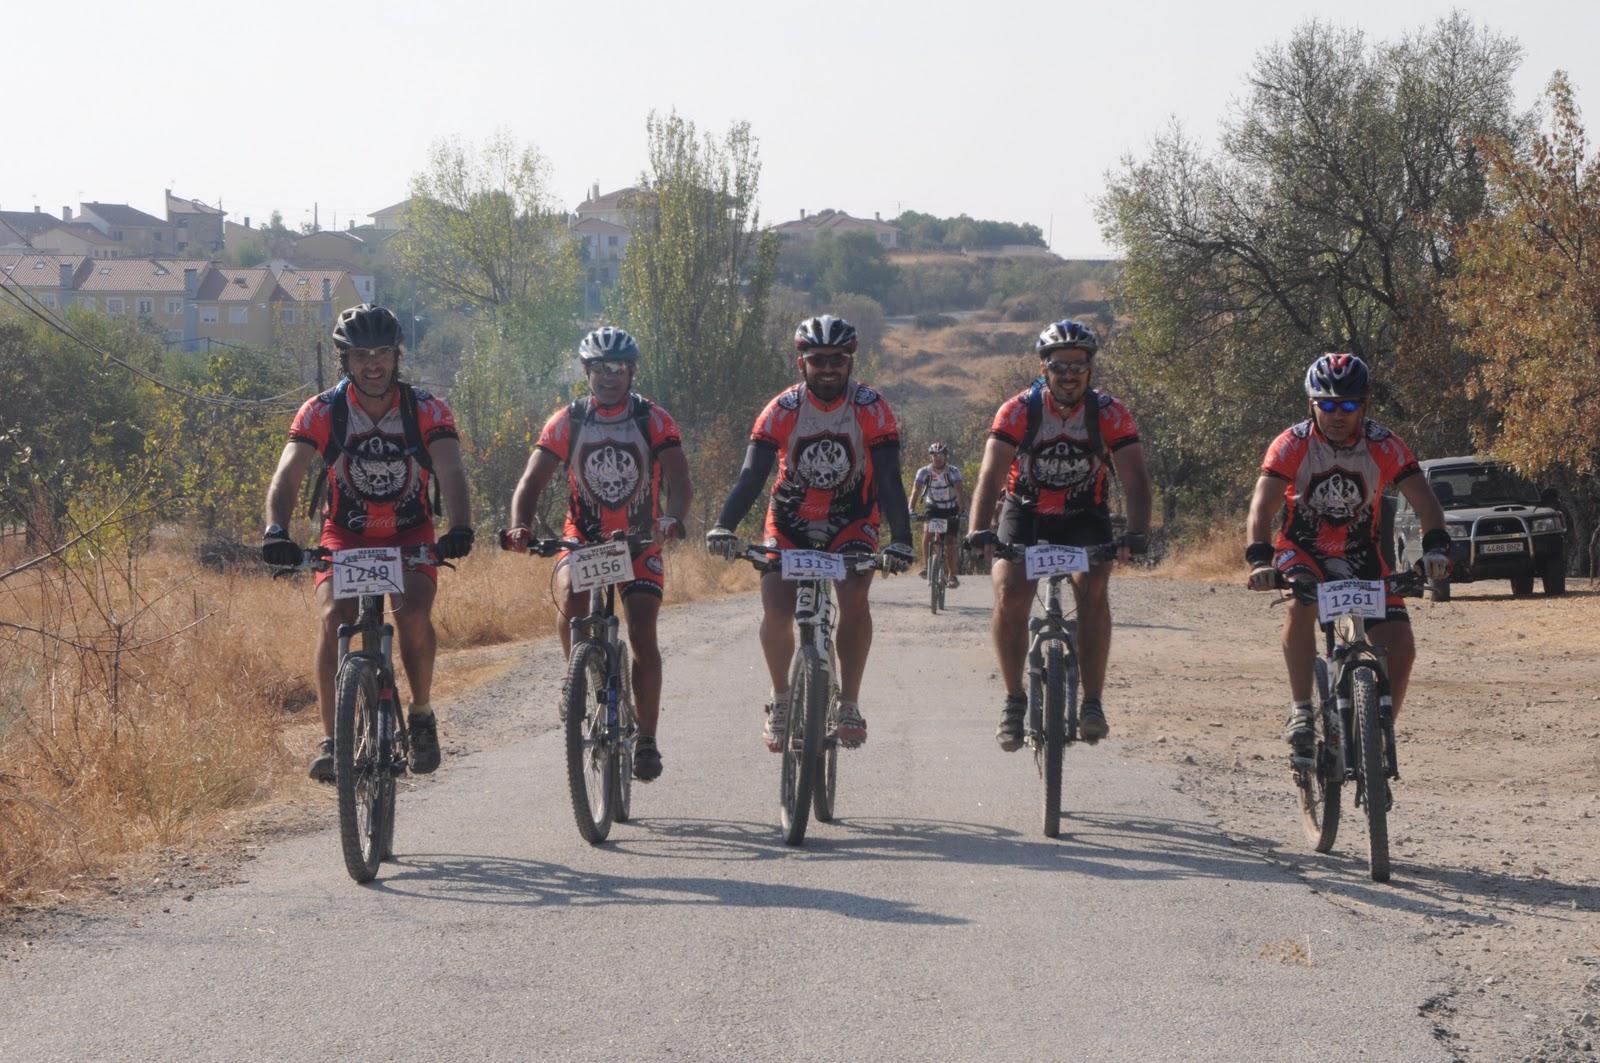 Rutas bicicleta de monta a carril bici anillo verde madrid - Anillo verde ciclista madrid mapa ...